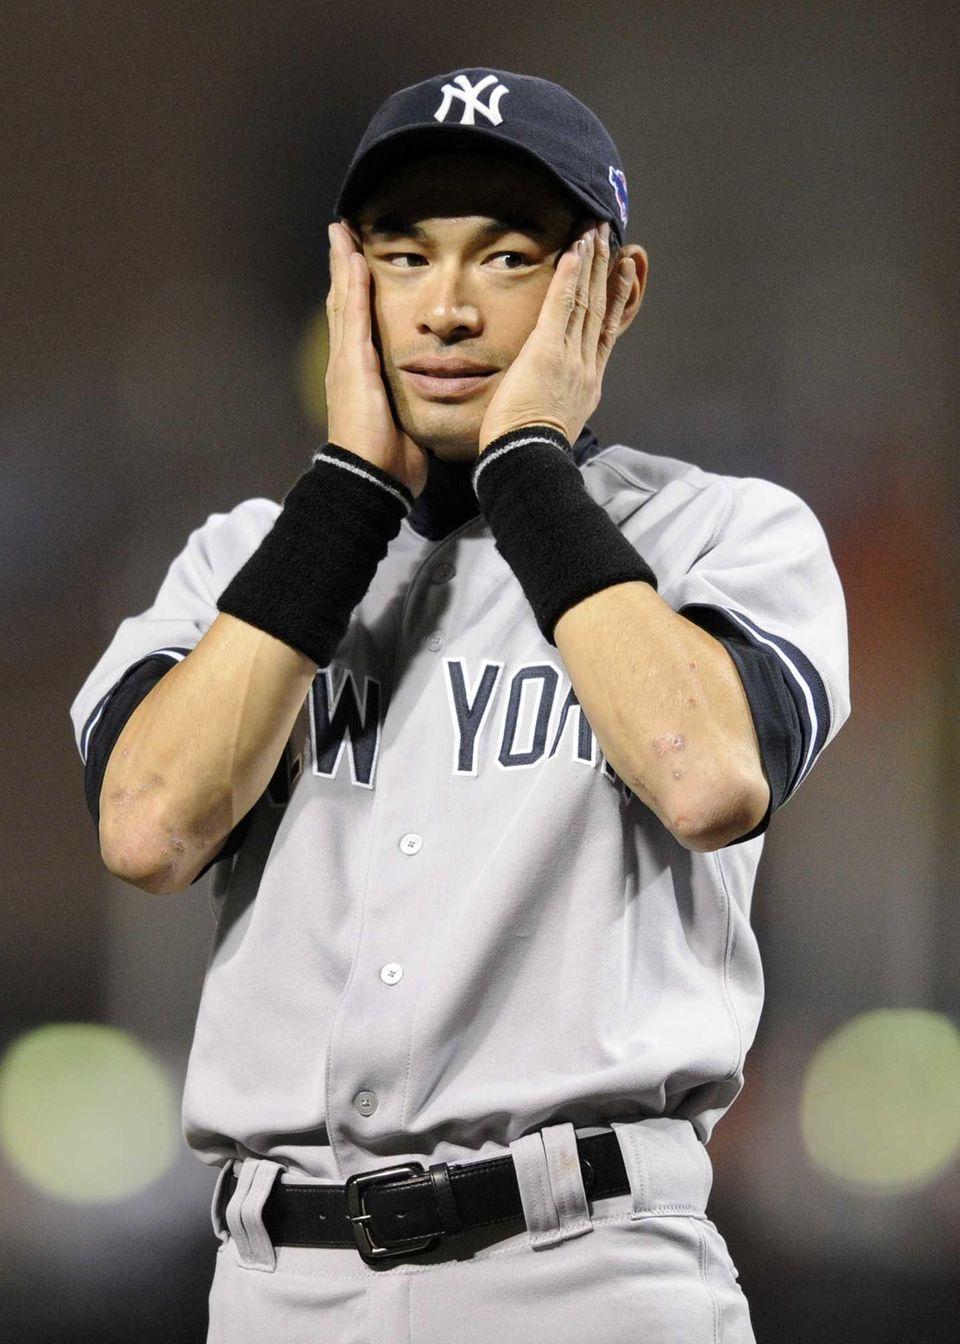 New York Yankees left fielder Ichiro Suzuki reacts